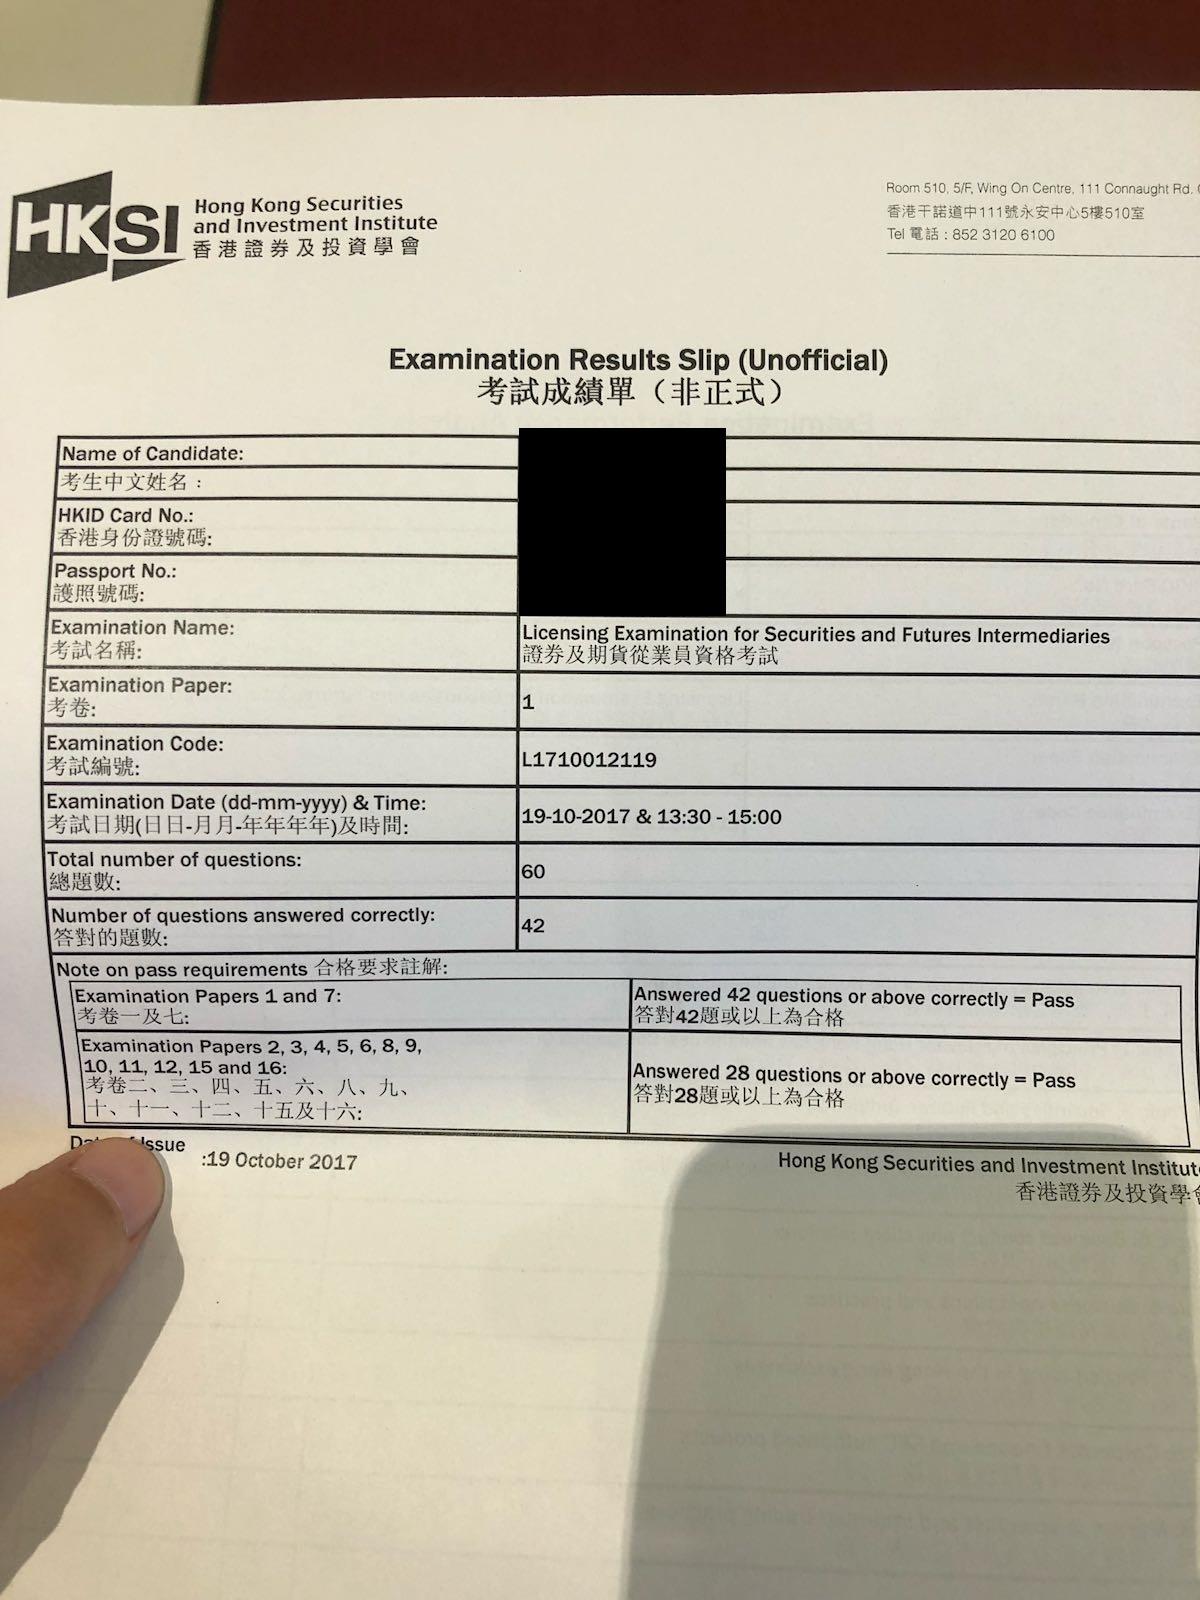 KHB 19/10/2017 LE Paper 1 證券期貨從業員資格考試卷一 Pass